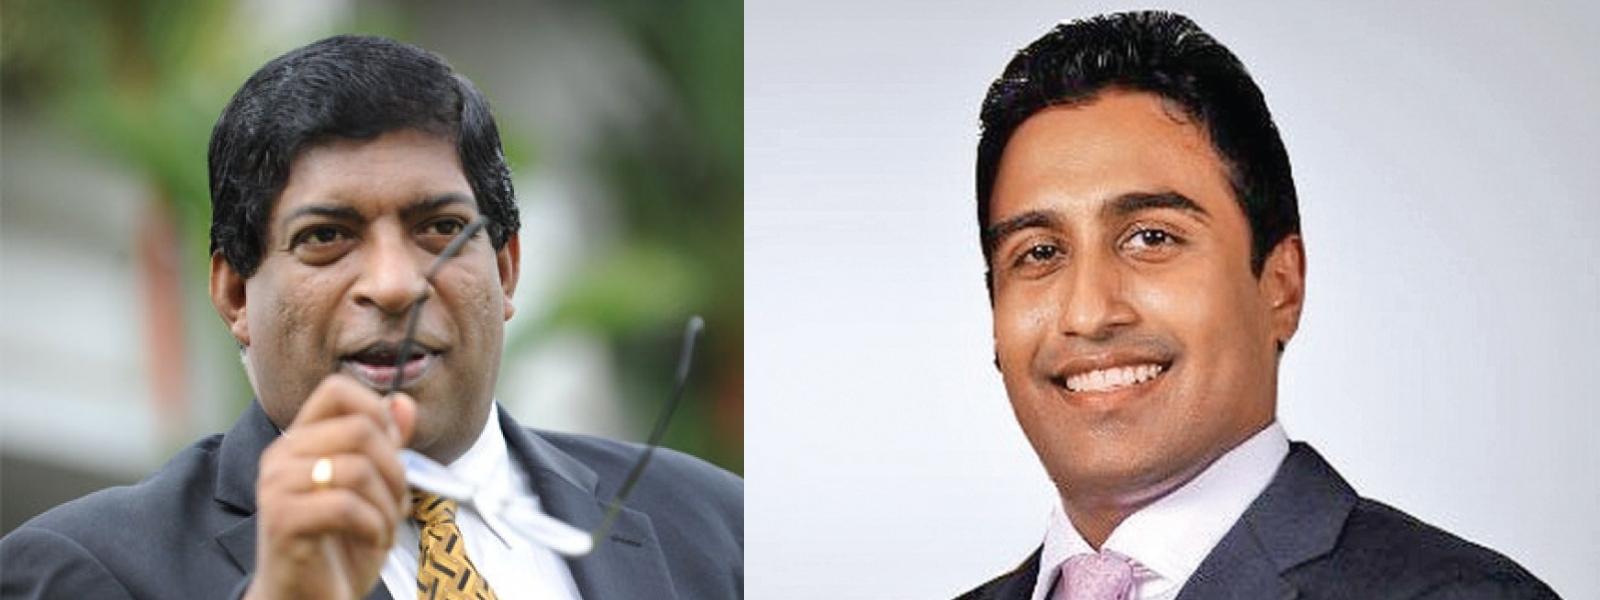 Bribery cases filed against Ravi Karunanayake and Arjun Aloysius